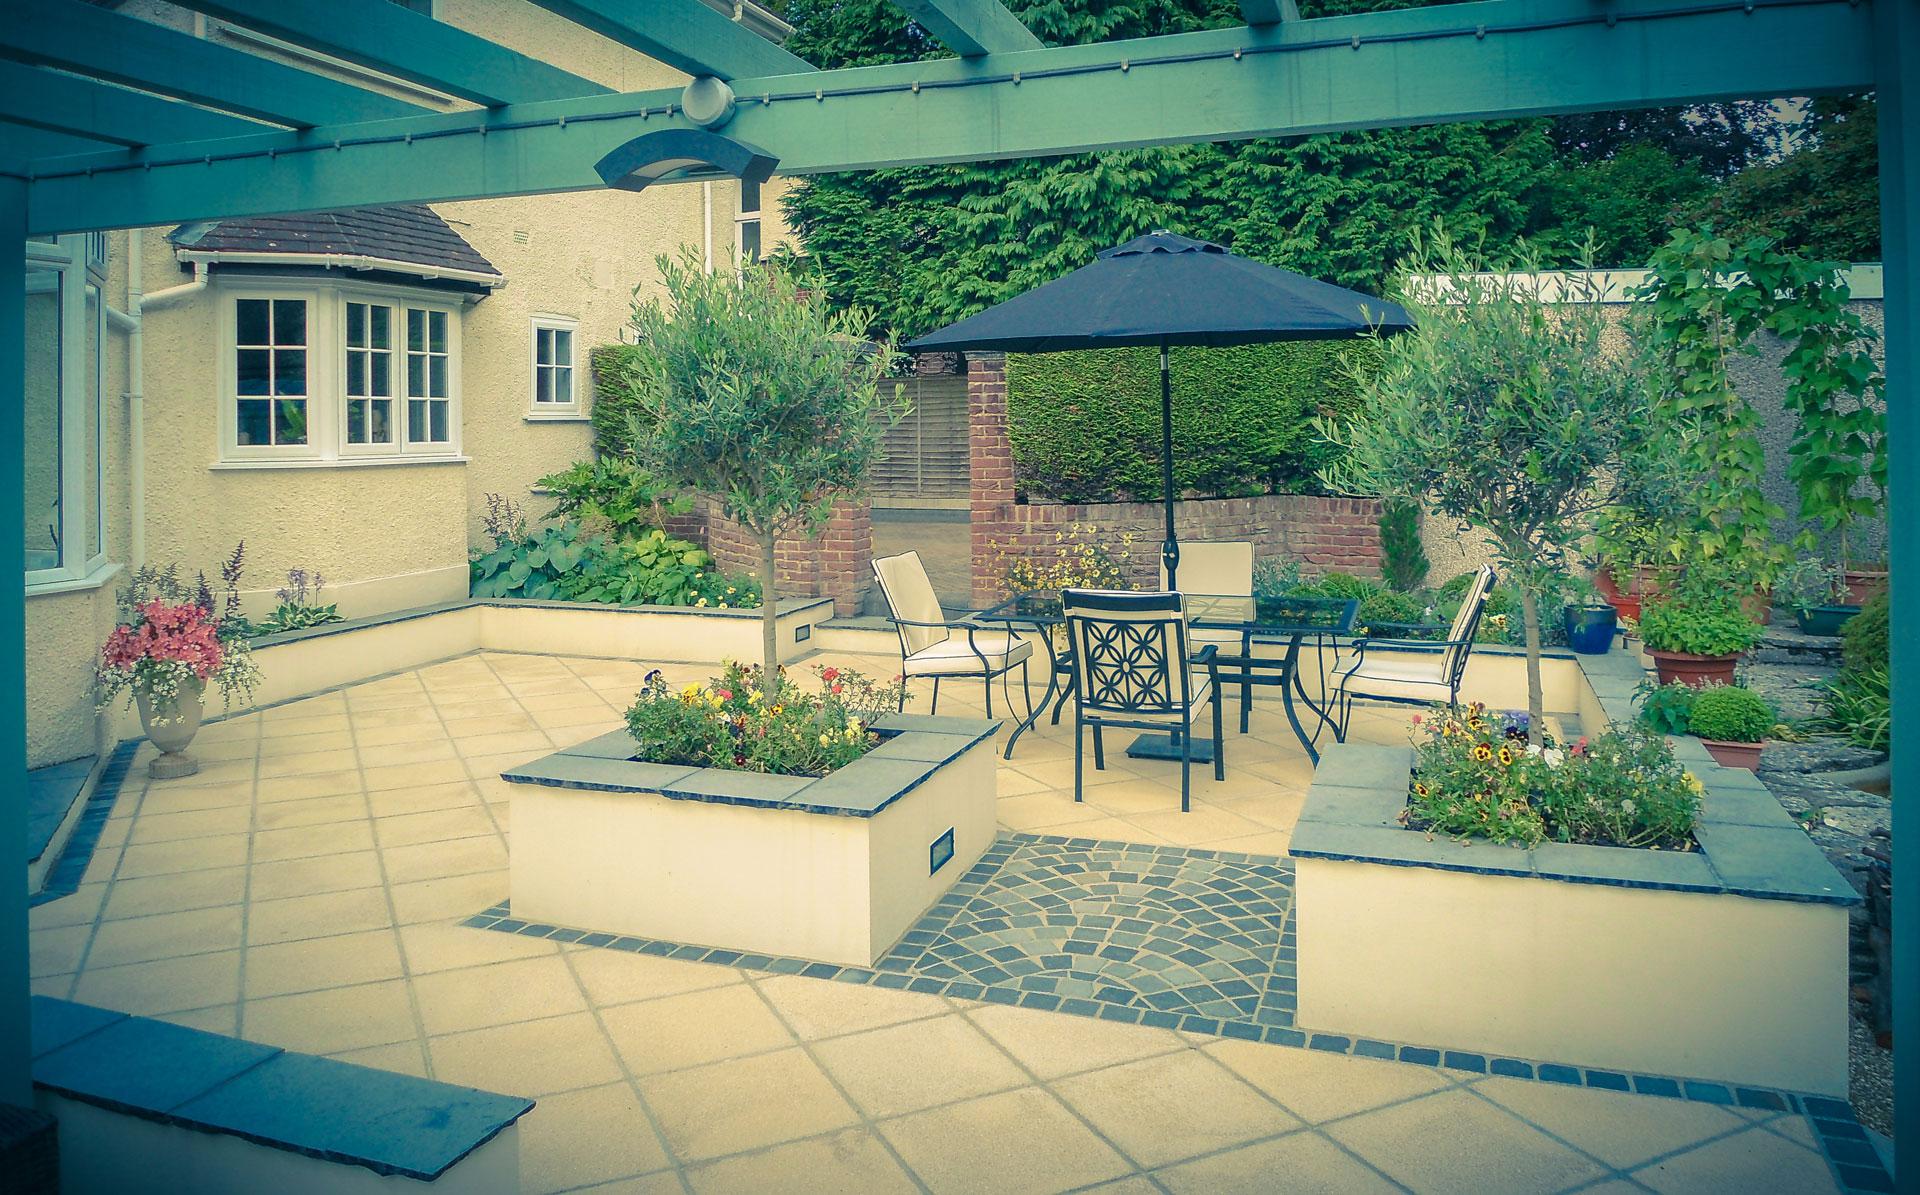 Image of Italian Garden Designed By Tom Hill